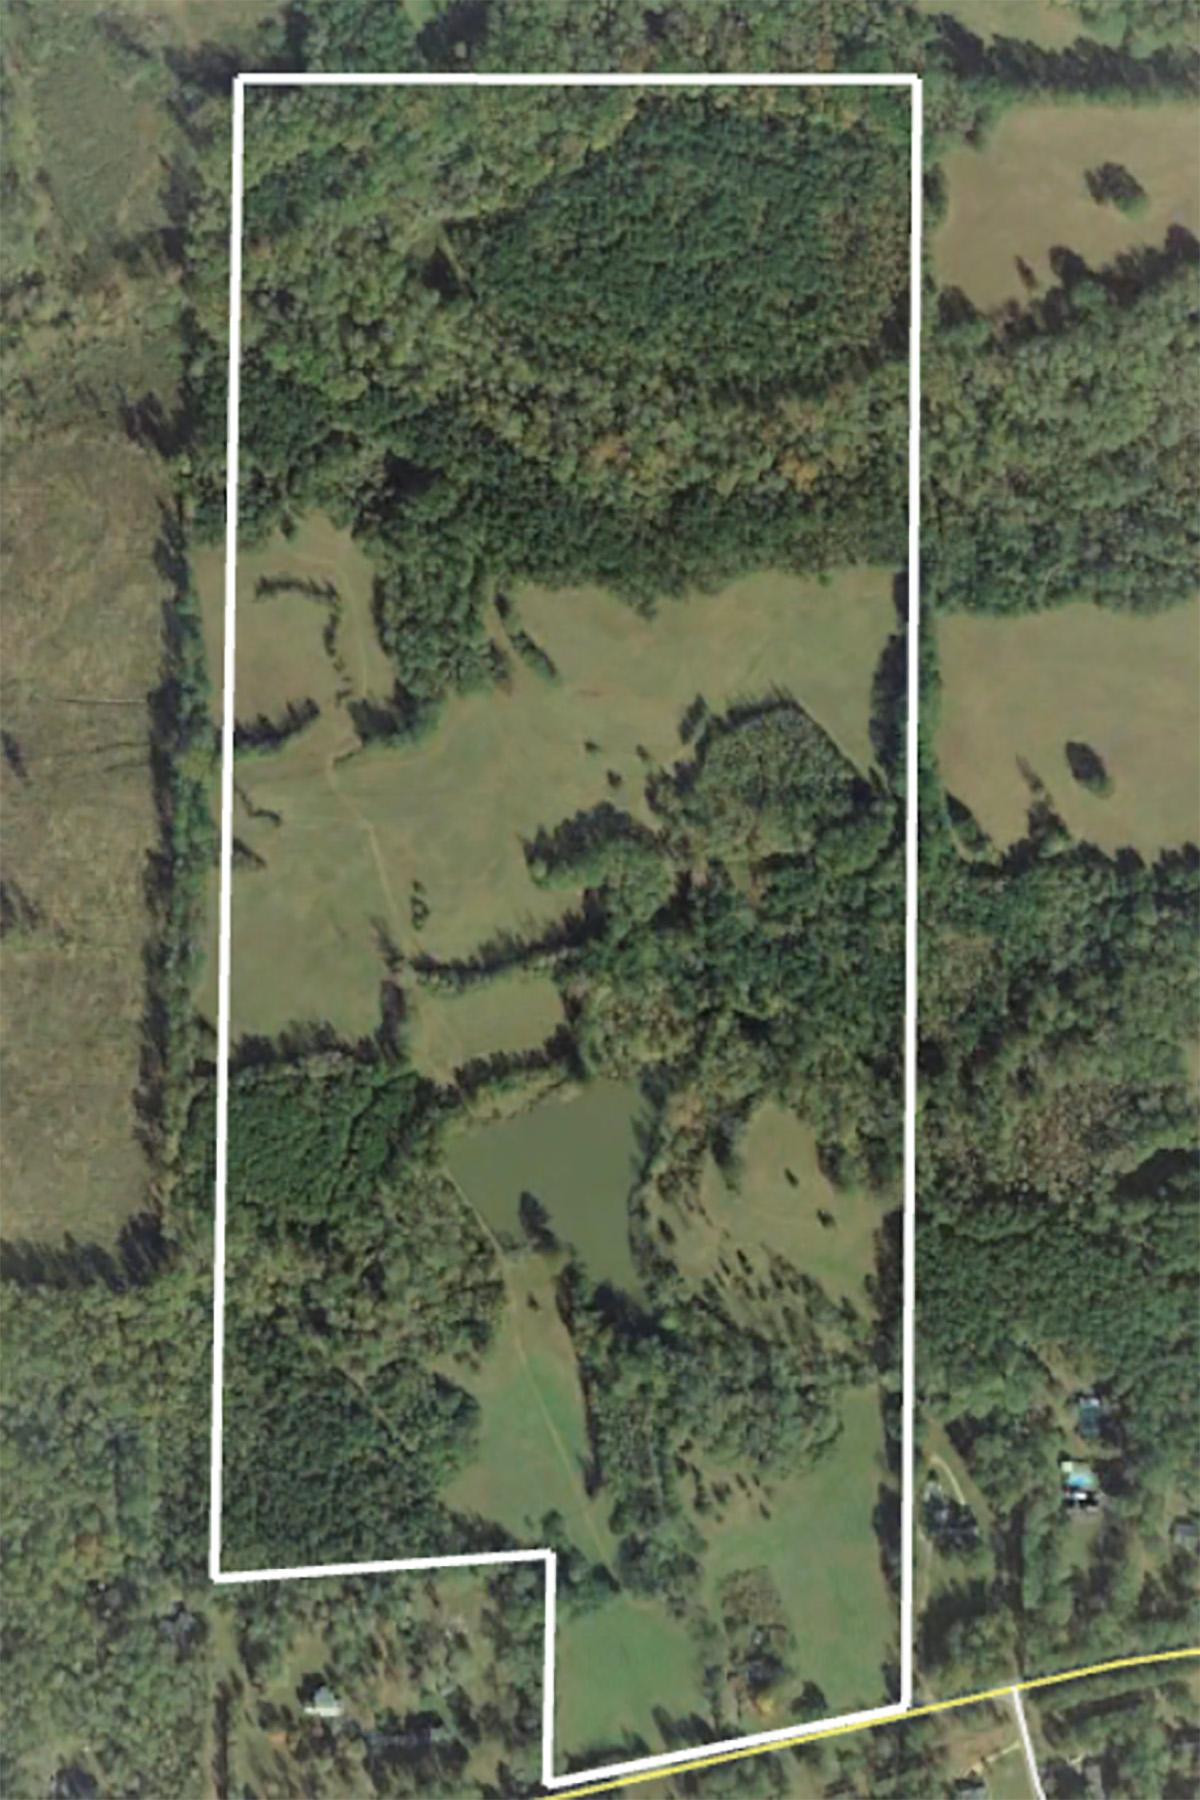 Ферма / ранчо / плантация для того Продажа на Beautiful, Private Property Is A Rare Find Land Tract In Henry County 1503 Hampton Locust Grove Road, Locust Grove, Джорджия 30248 Соединенные Штаты